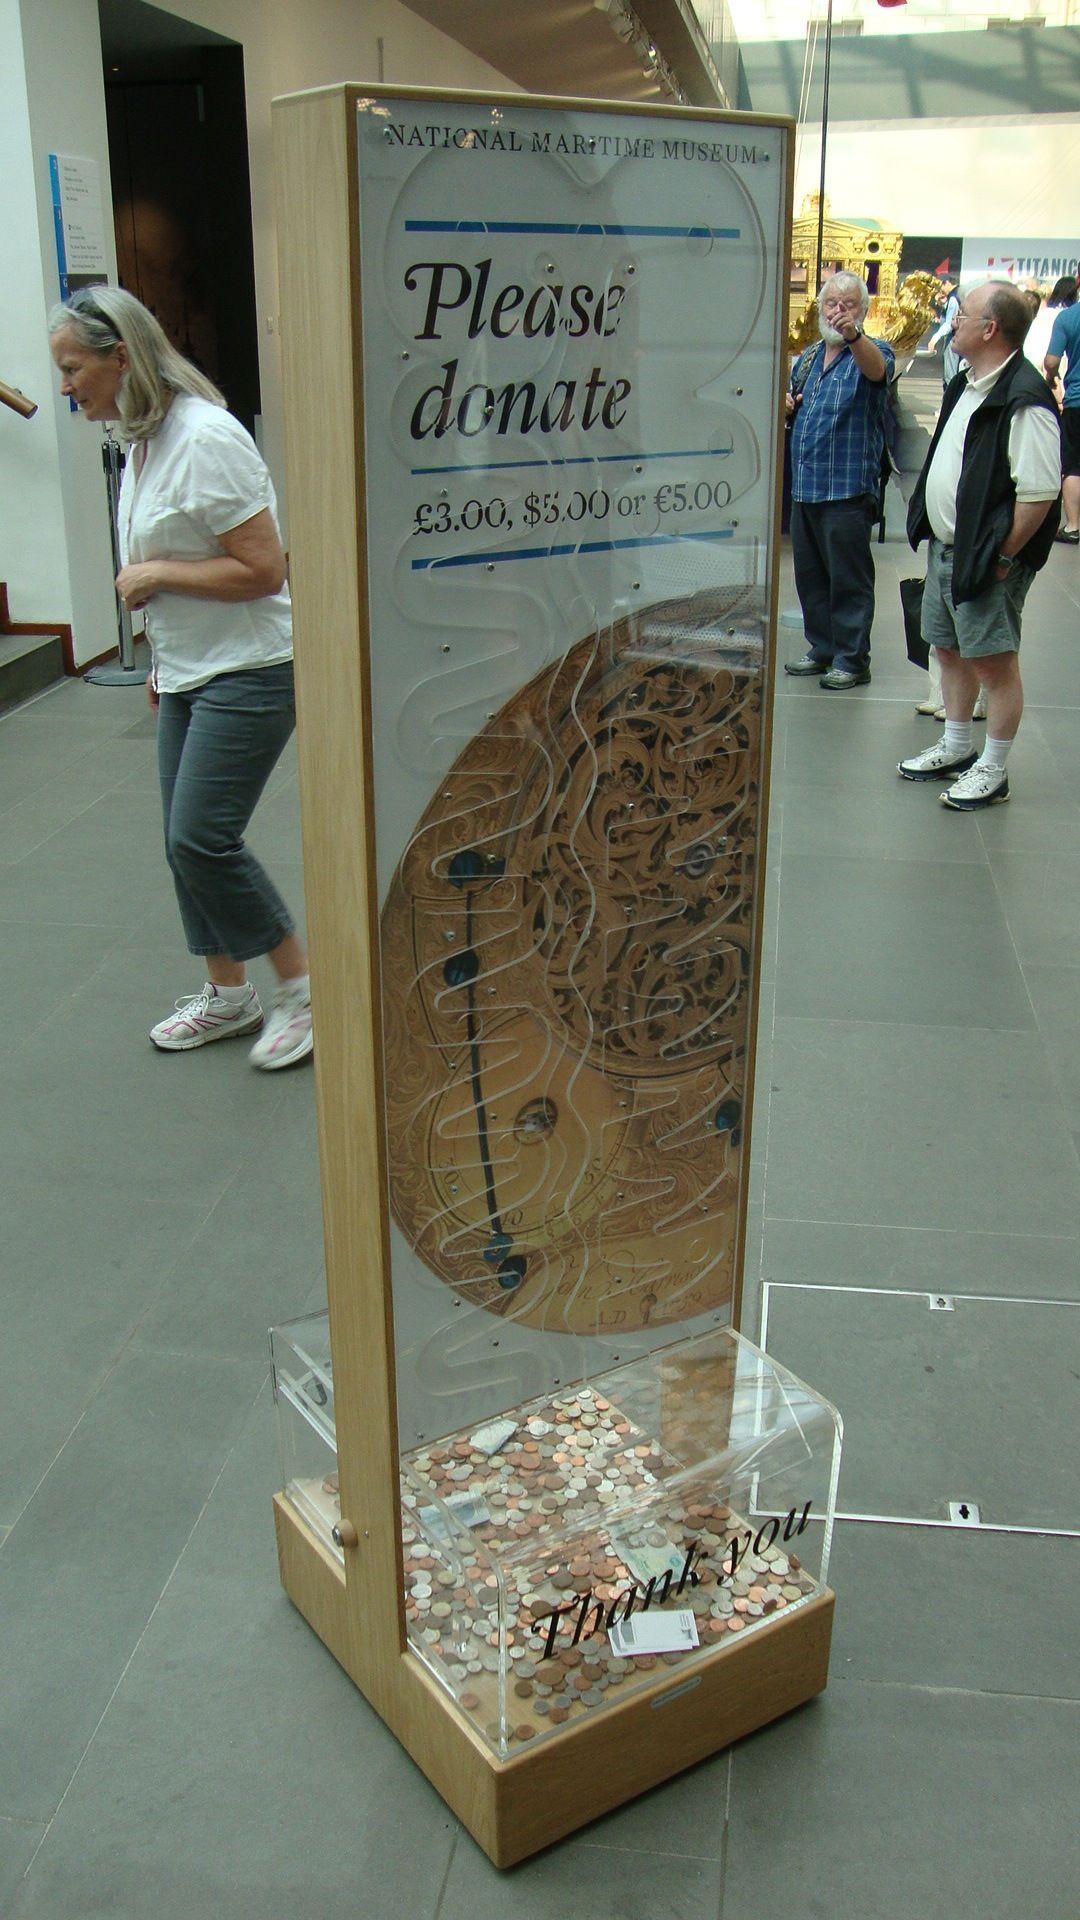 national maritime museum donation box | ideas para el centro